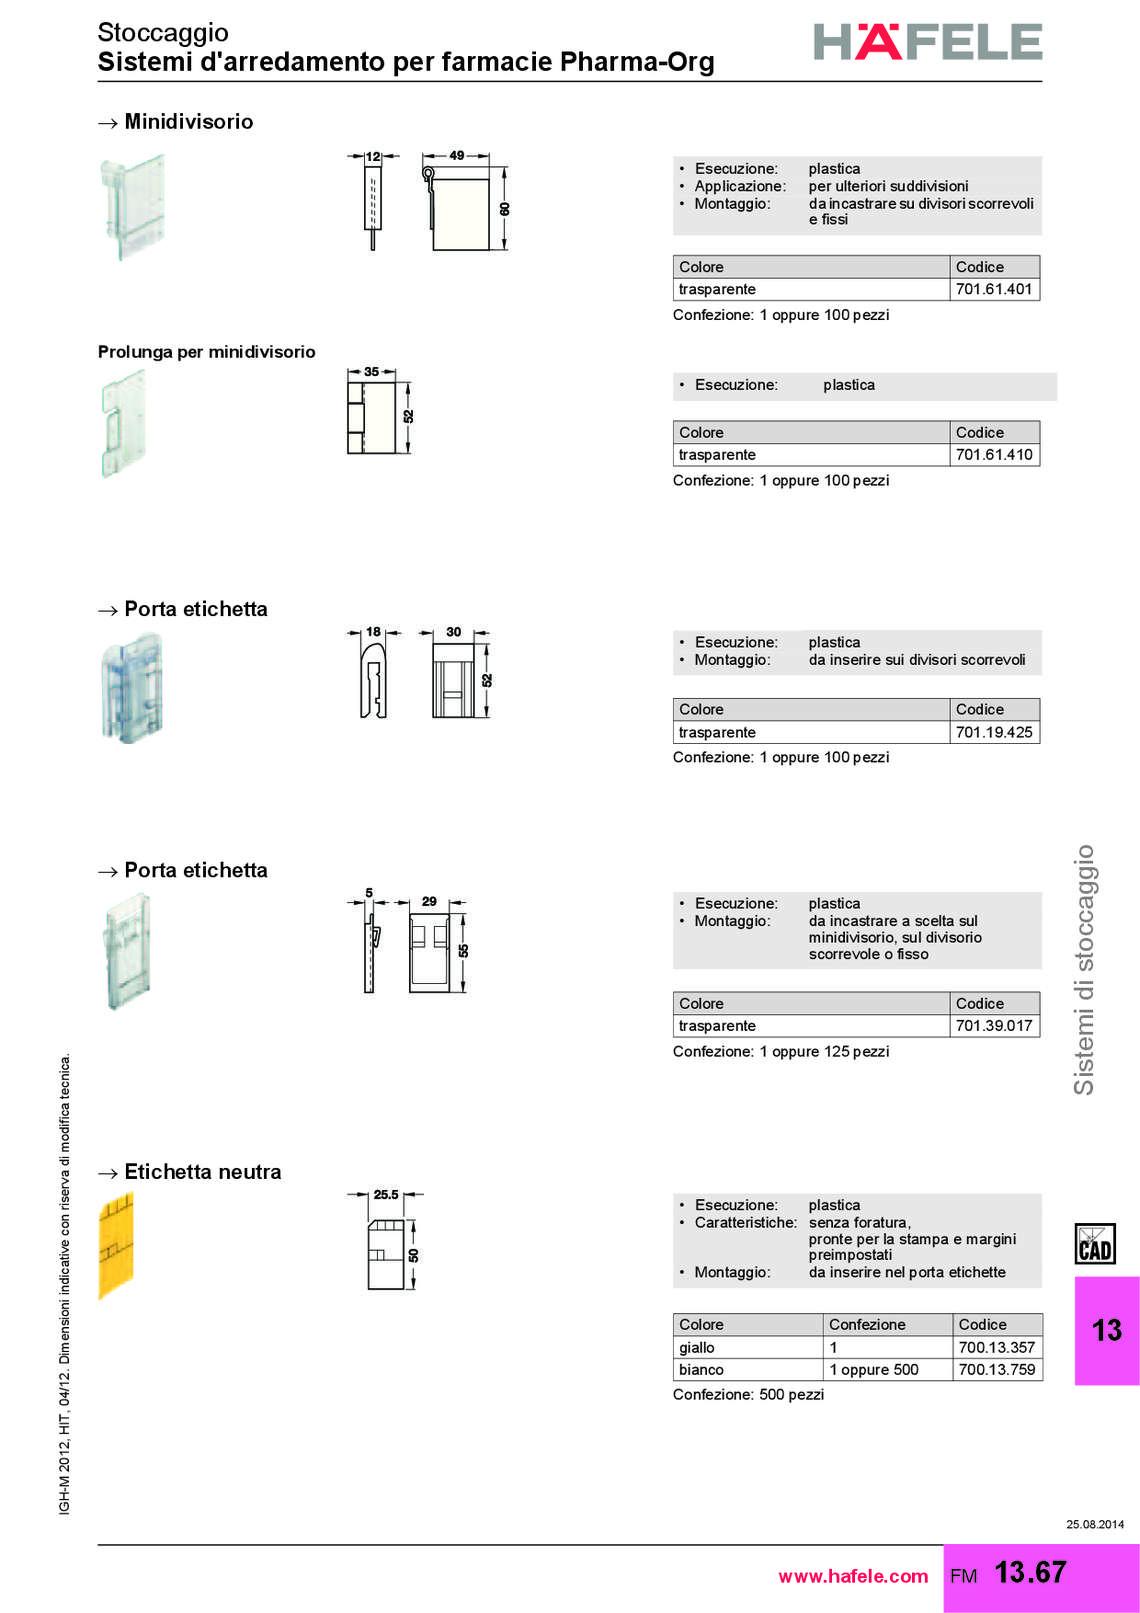 hafele-arredo-negozi-e-farmacie_32_078.jpg